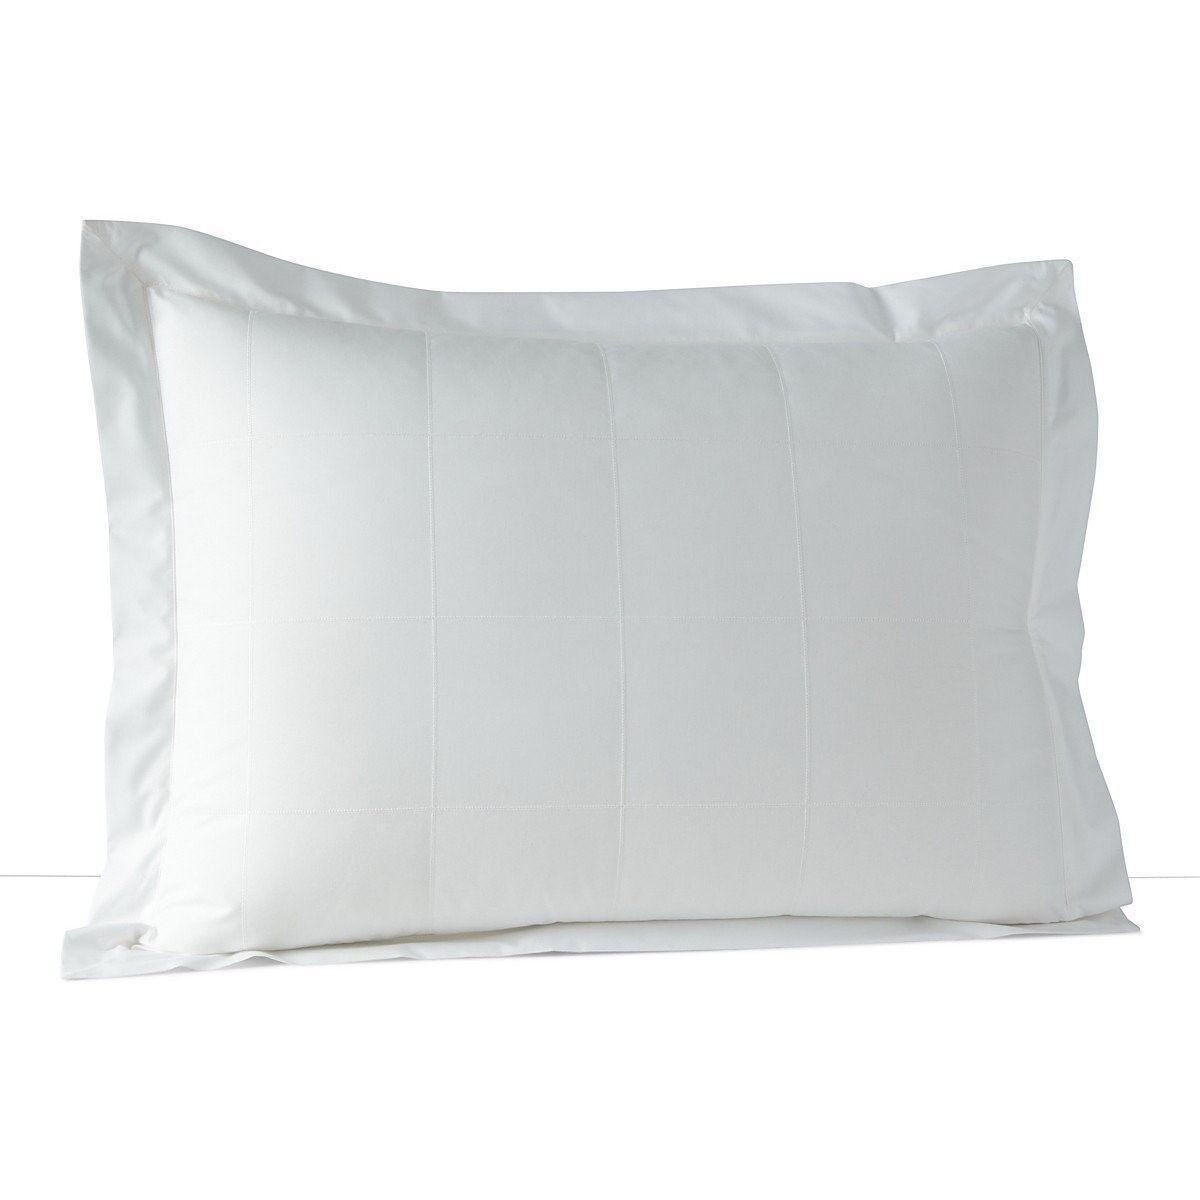 1 Ralph Lauren Classic Hemstitch standard bianca Sham  185